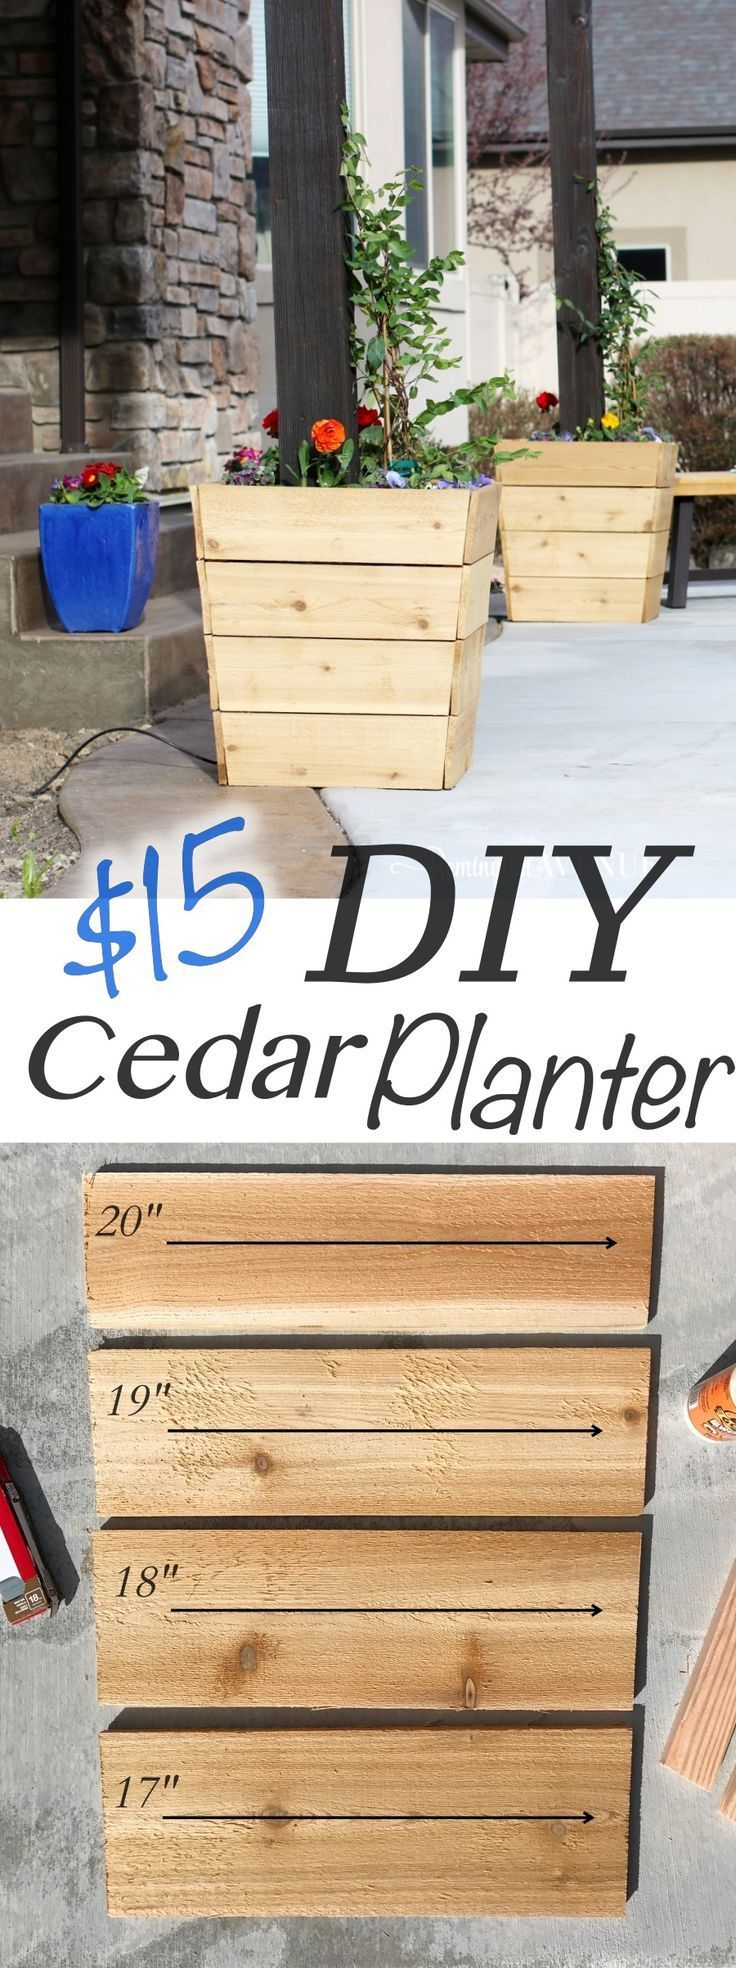 $15 Modern Cedar Planter - Remington Avenue